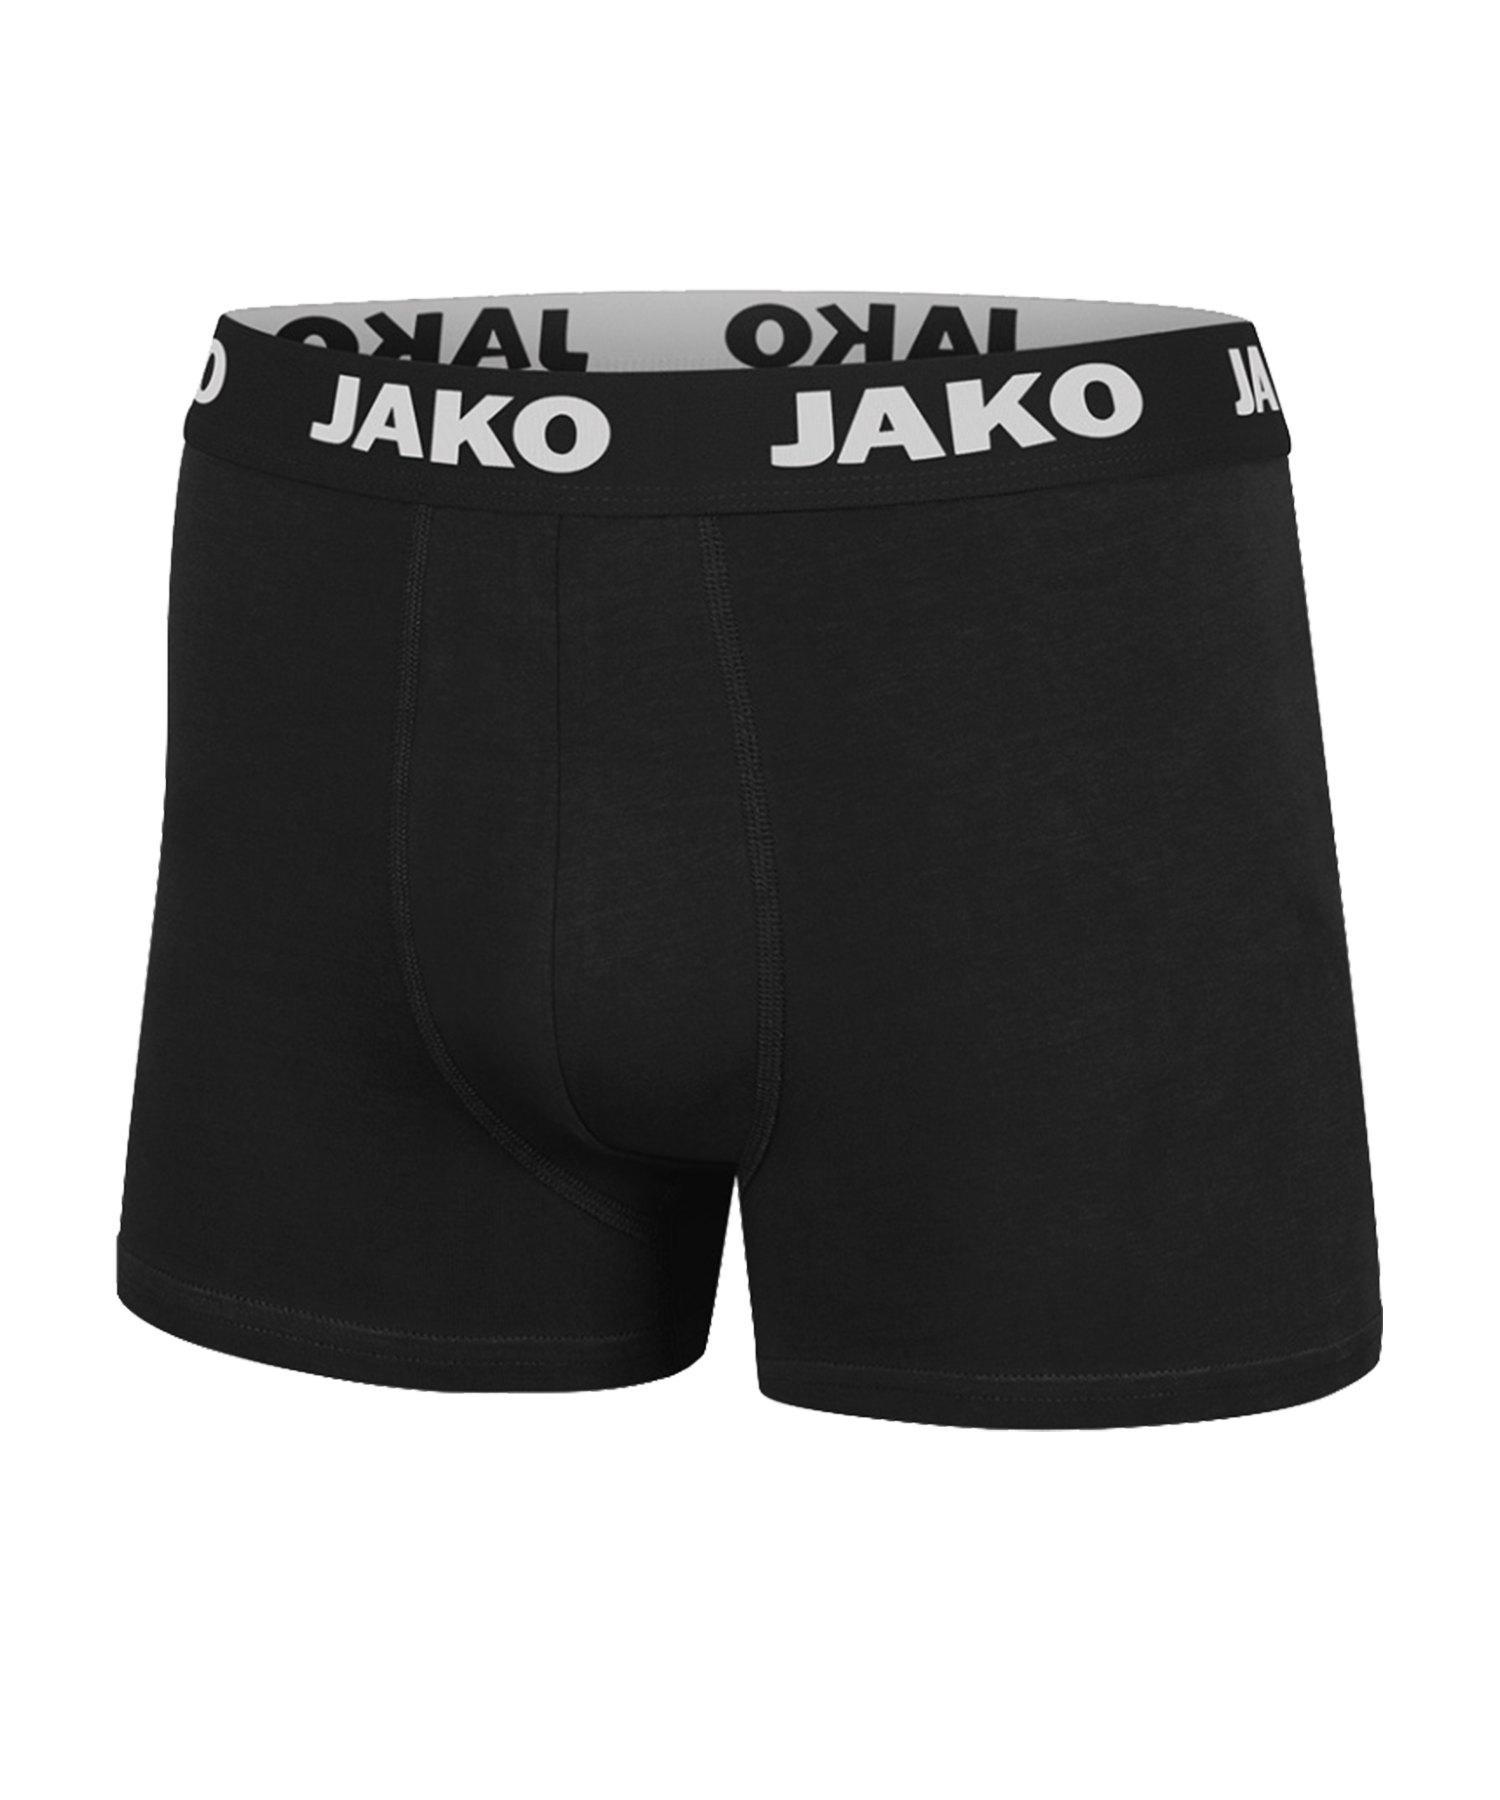 Jako Boxershorts Basic 2er Pack Schwarz F08 - schwarz